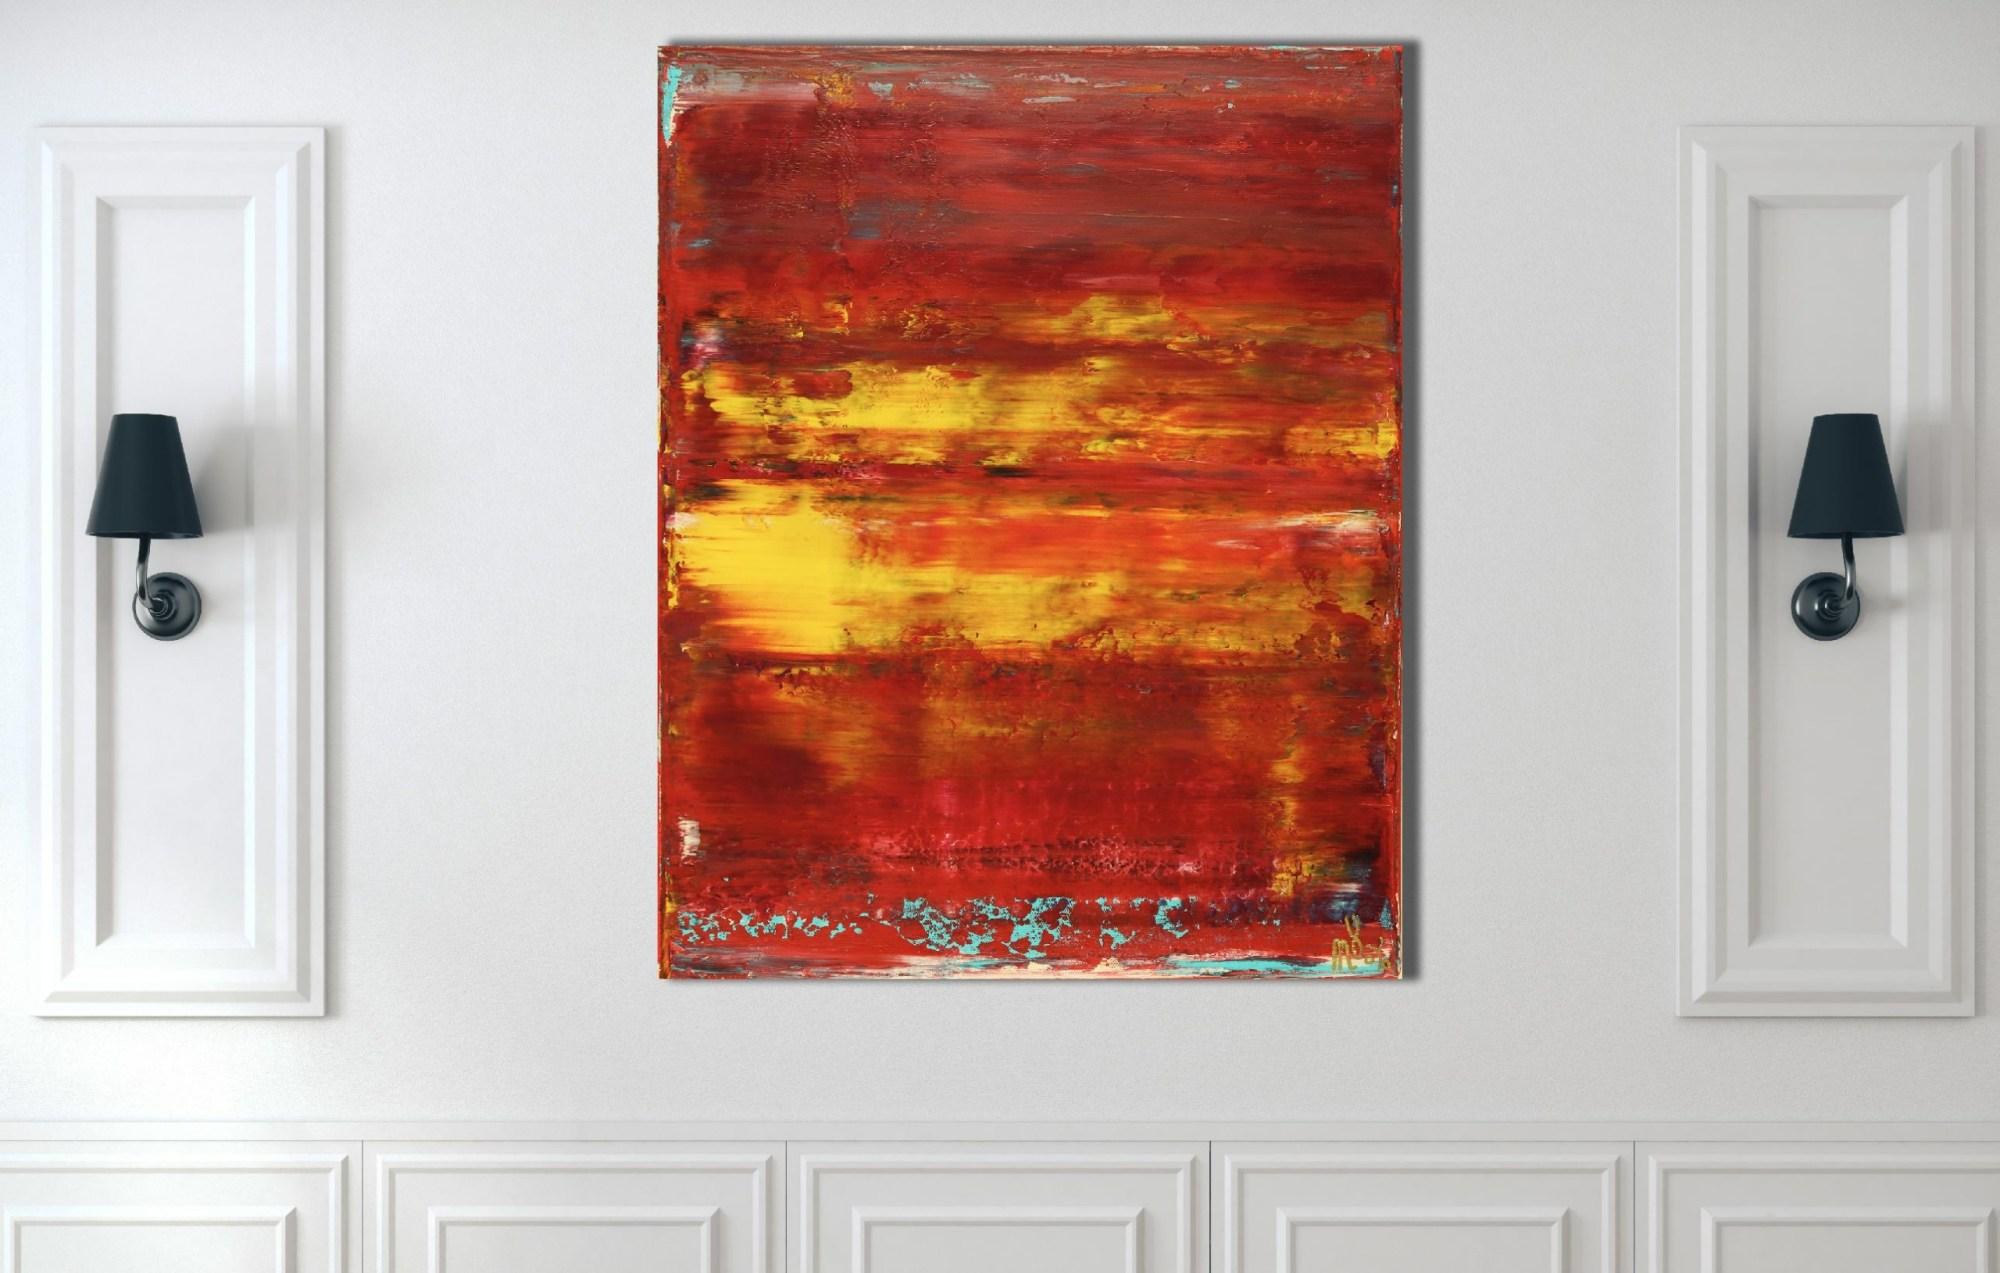 Room View - Rojo Infinito (Fiery Spectra) #2 (2020) by Nestor Toro